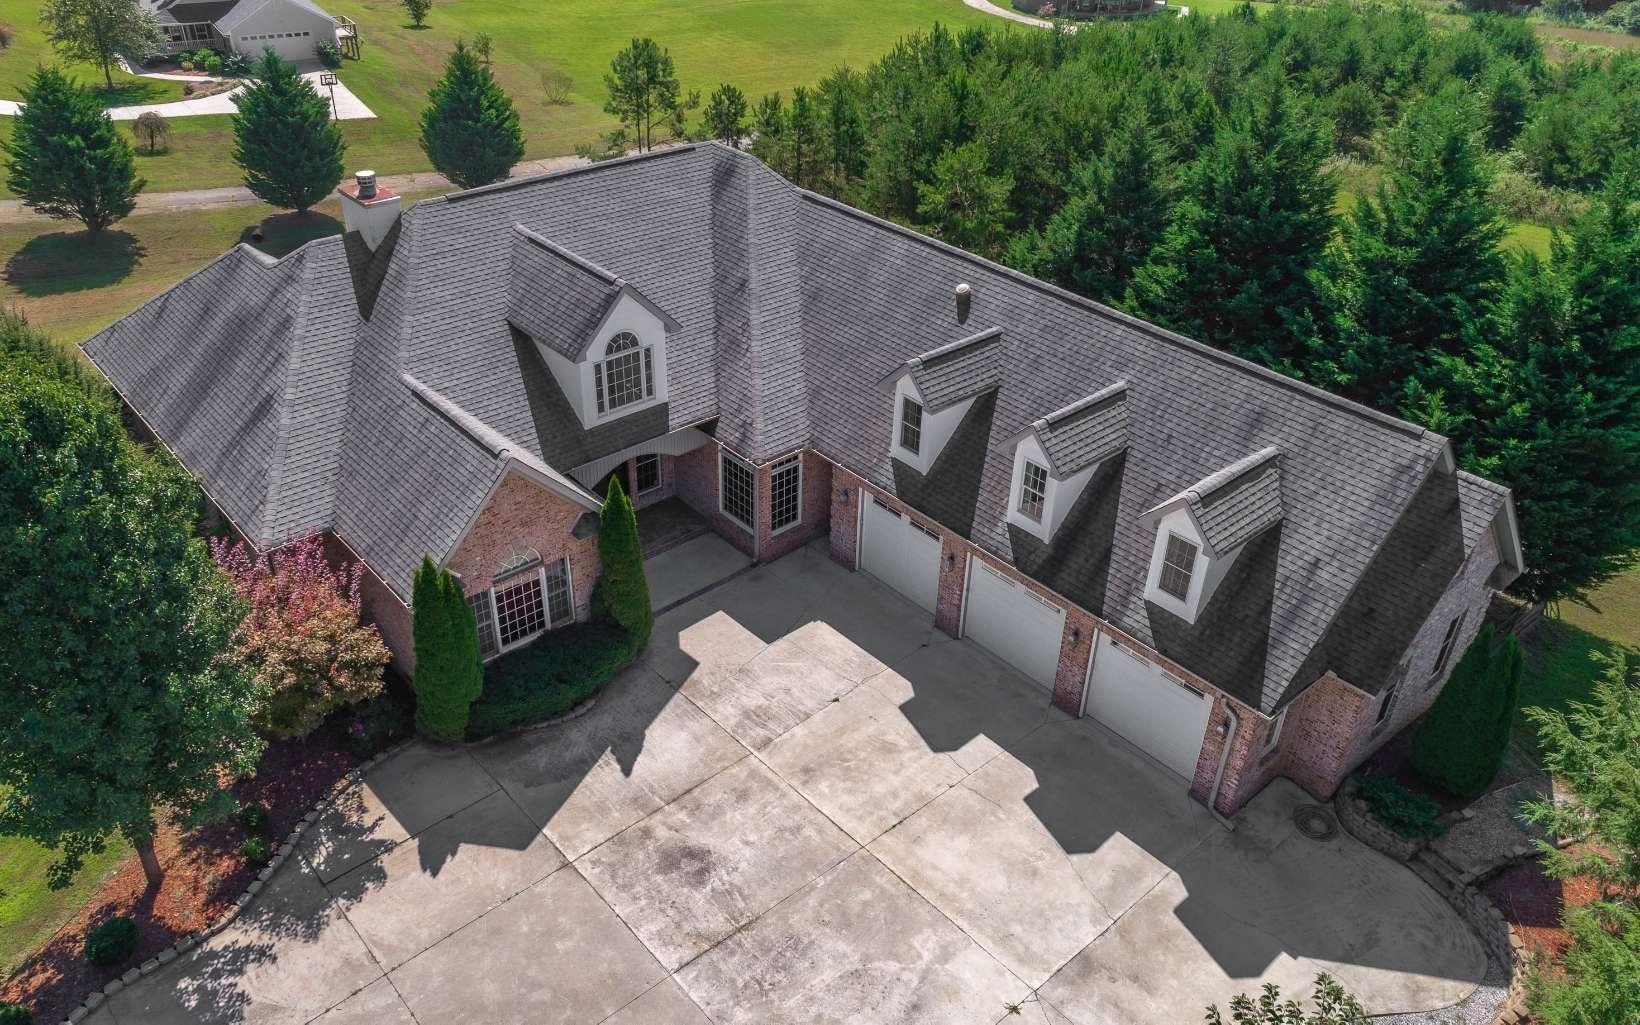 26 FOUNTAIN OAKS, Blairsville, Georgia 30512, 5 Bedrooms Bedrooms, ,4 BathroomsBathrooms,Single Family,For Sale,26 FOUNTAIN OAKS,305352